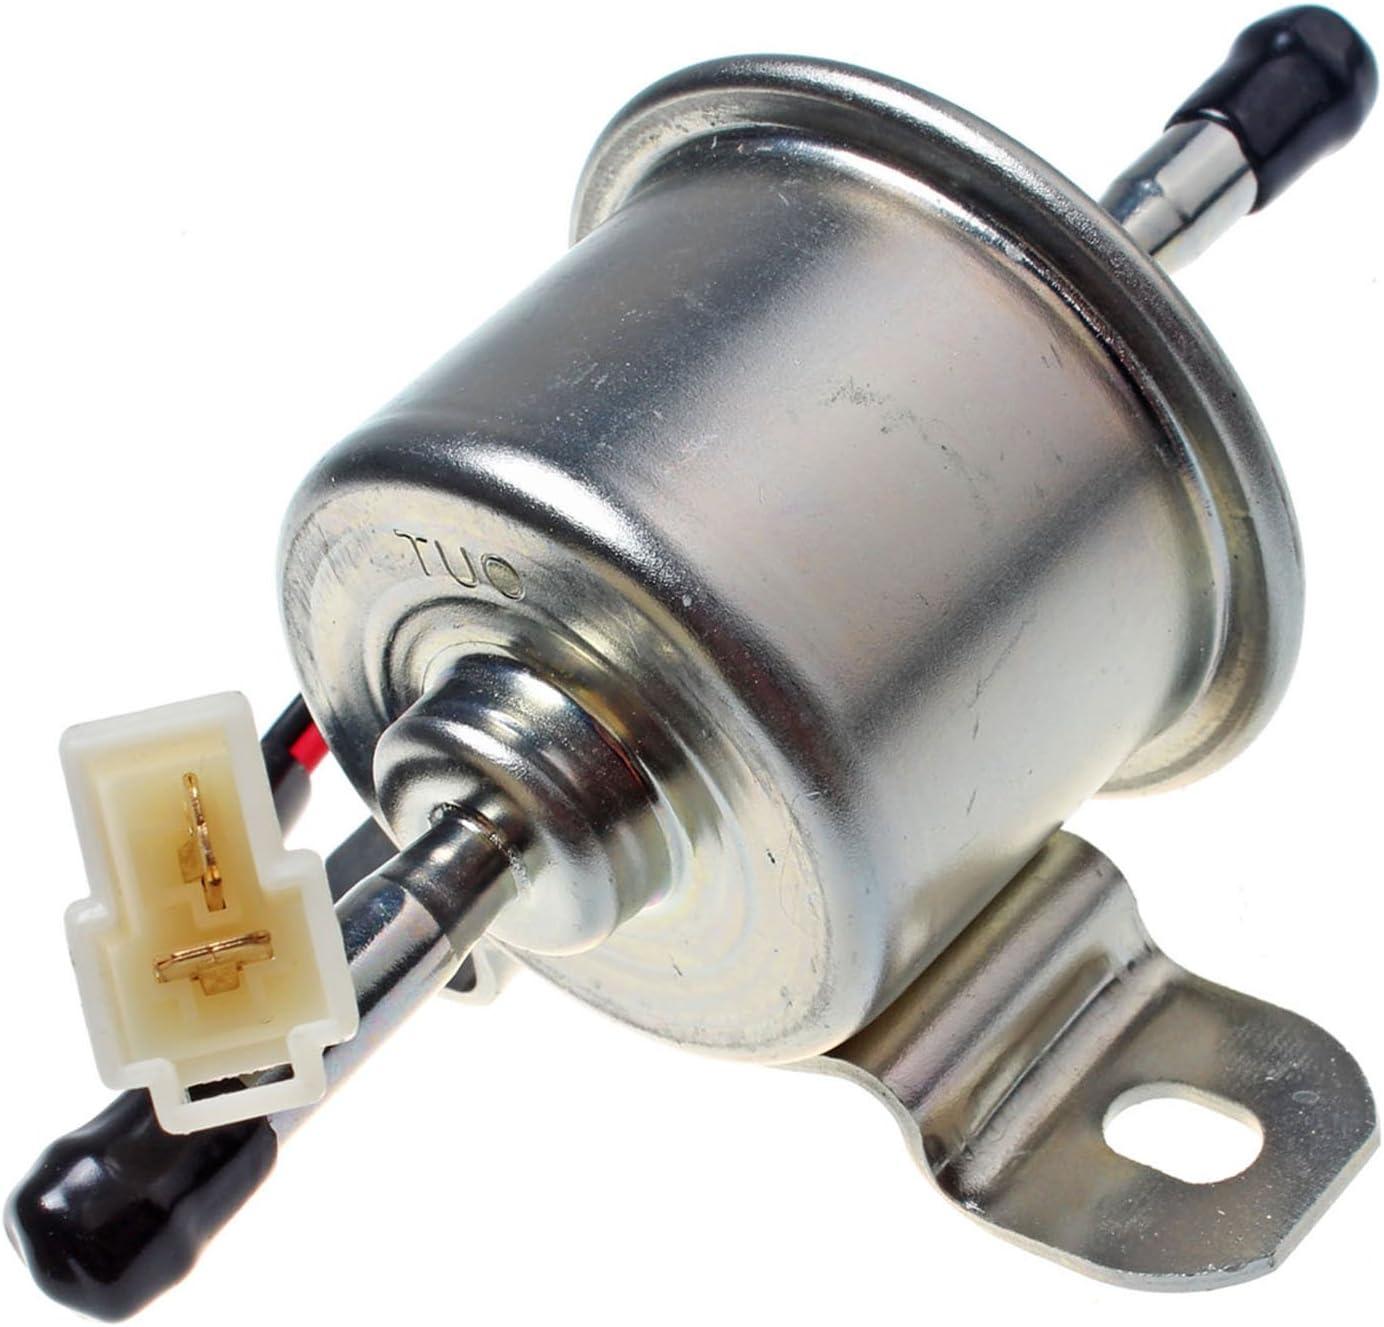 Mover Parts Fuel Pump RC601-51352 RC601-51350 for Kubota M108 BX2350 BX2360 BX23 BX23D BX24 BX24D BX22 BX25 BX2660 BX2660D ZD18 ZD18F ZD21 ZD21F ZD221 ZD25F ZD28 ZD28F ZD321 ZD321N ZD323 ZD326P ZD326S